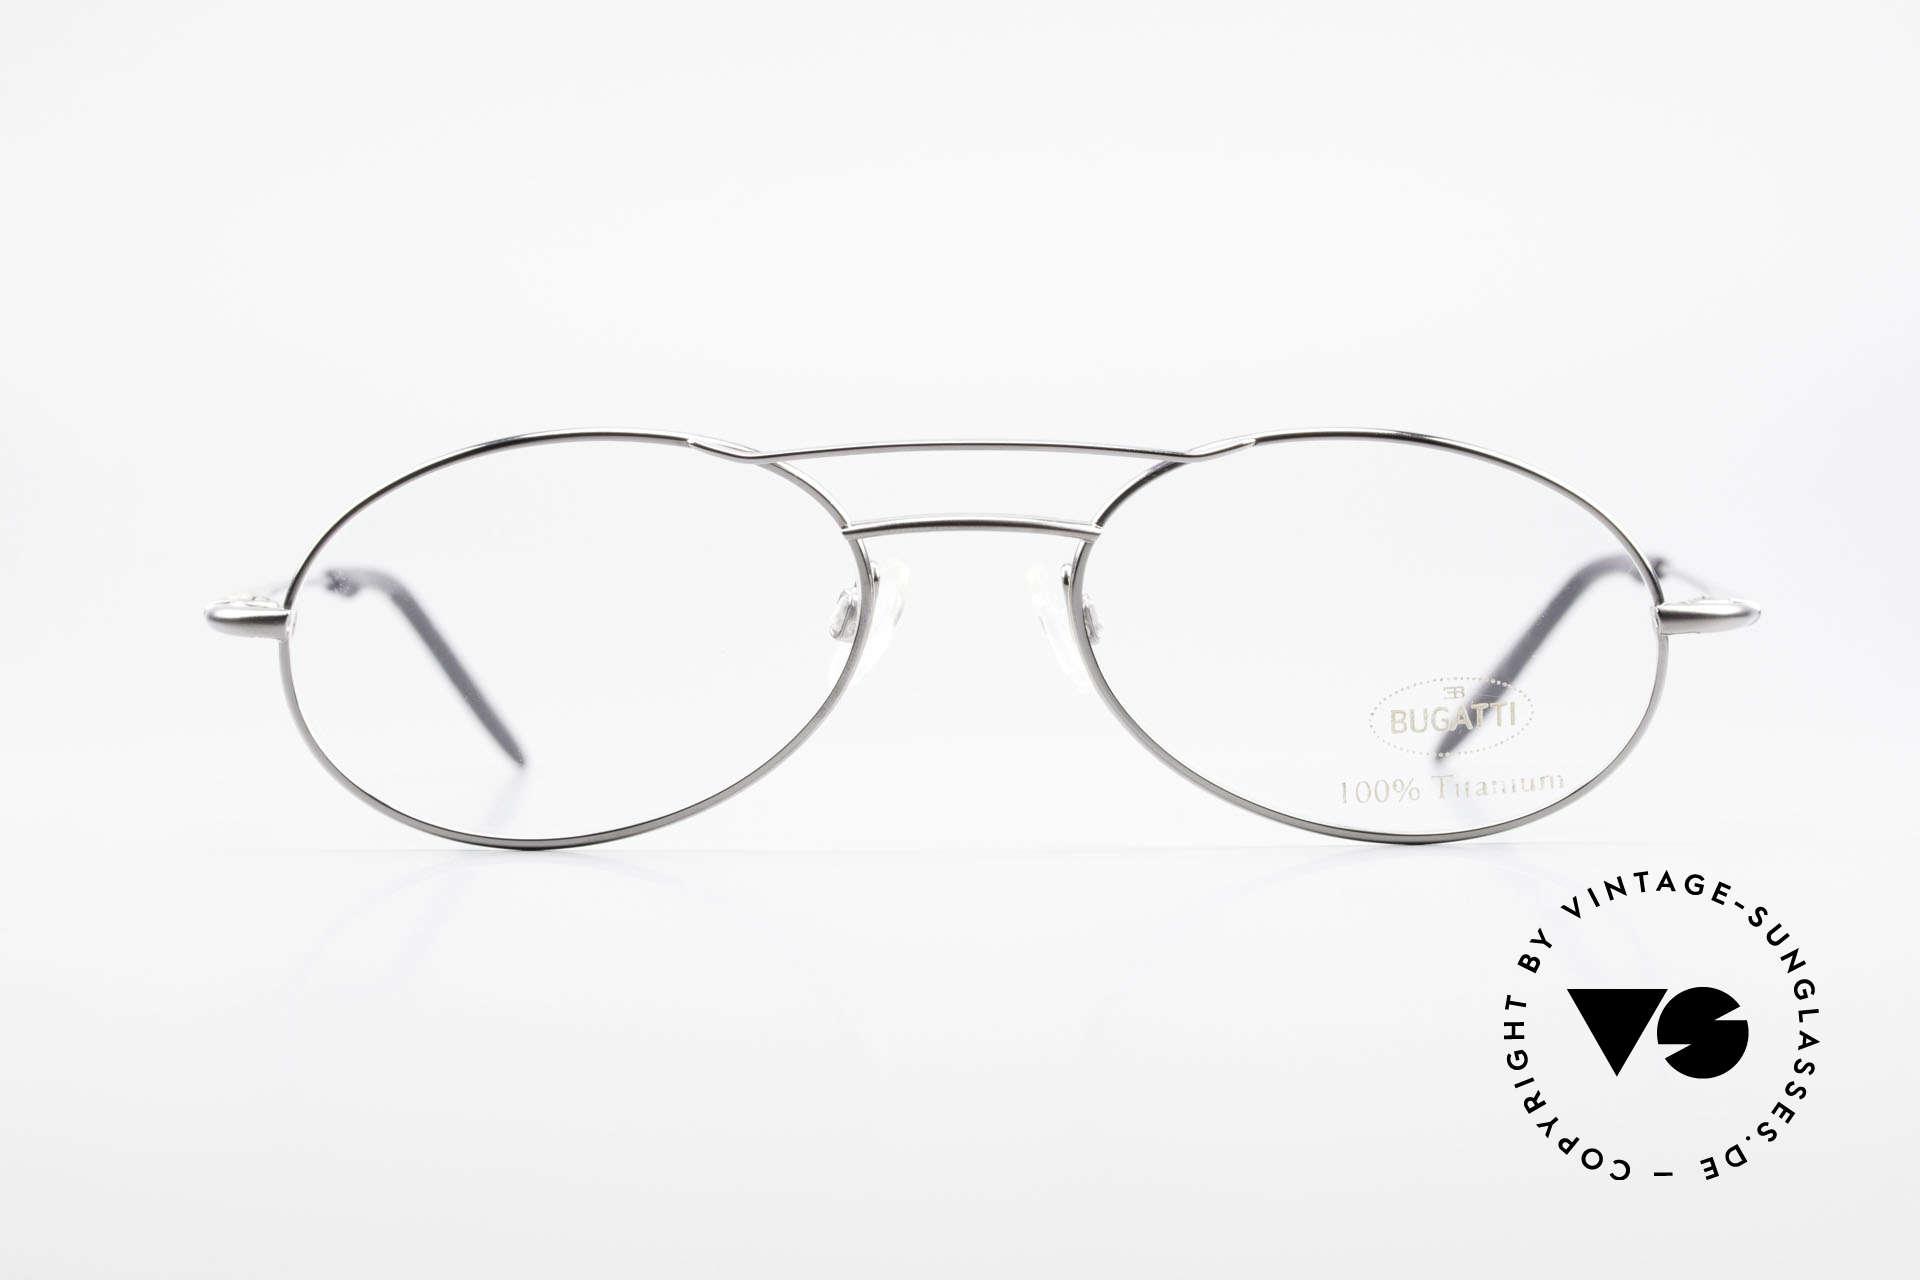 Bugatti 18861 Men's Titanium Eyeglasses, outstanding craftsmanship (lightweight 15g frame), Made for Men